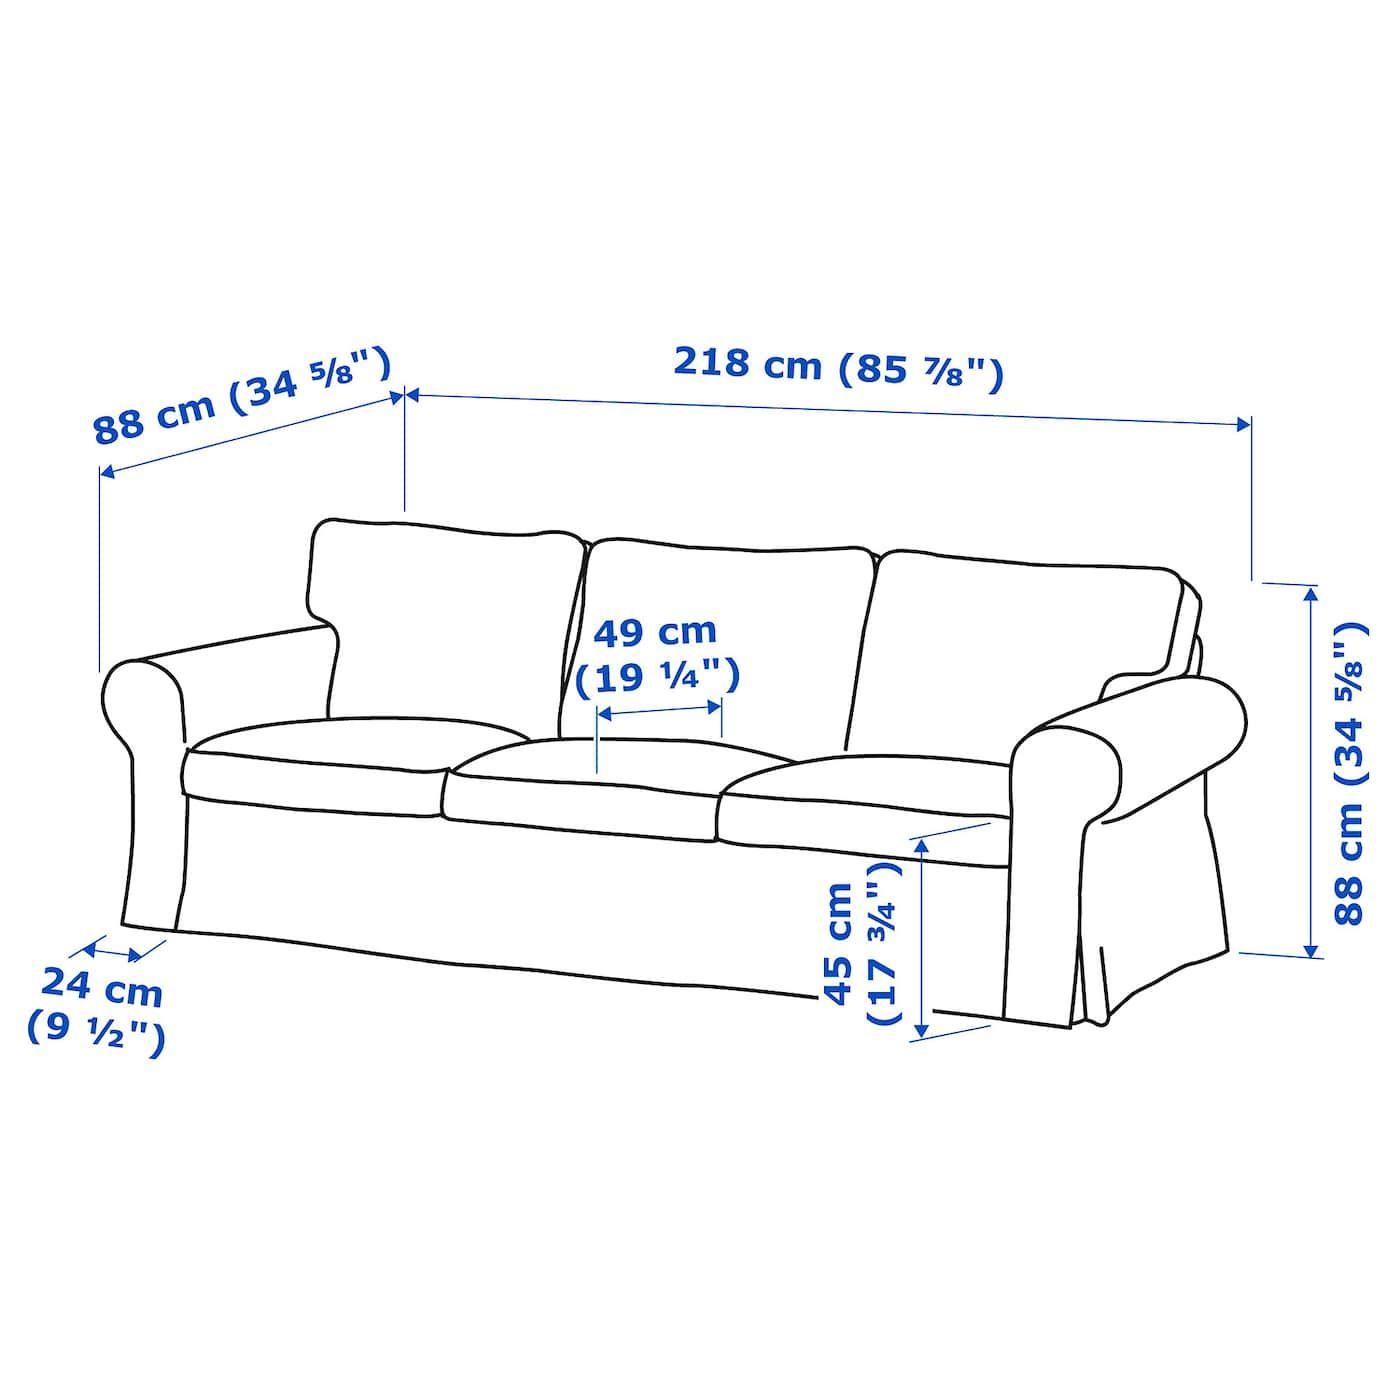 Ikea Ektorp Divano Letto A 3 Posti.Ektorp Divano A 3 Posti Lofallet Beige Nel 2020 Divano Ektorp